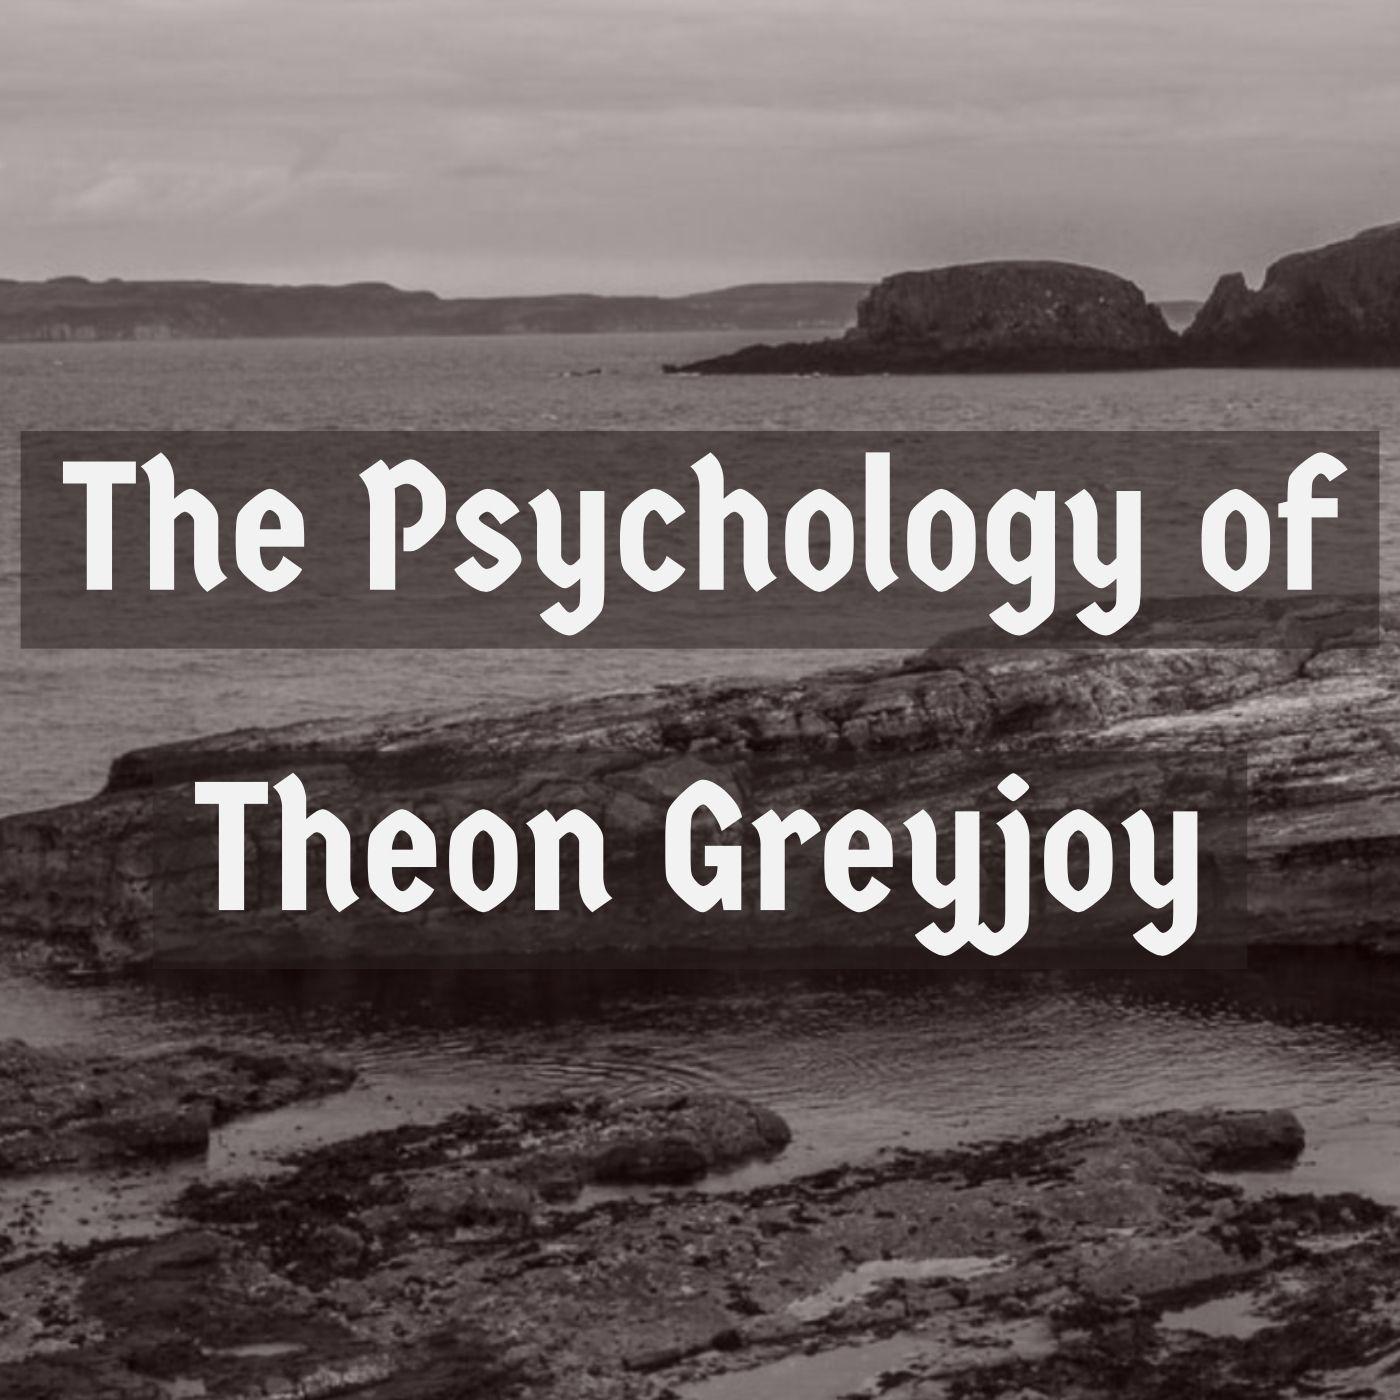 The Psychology of Theon Greyjoy (2017 Rerun)